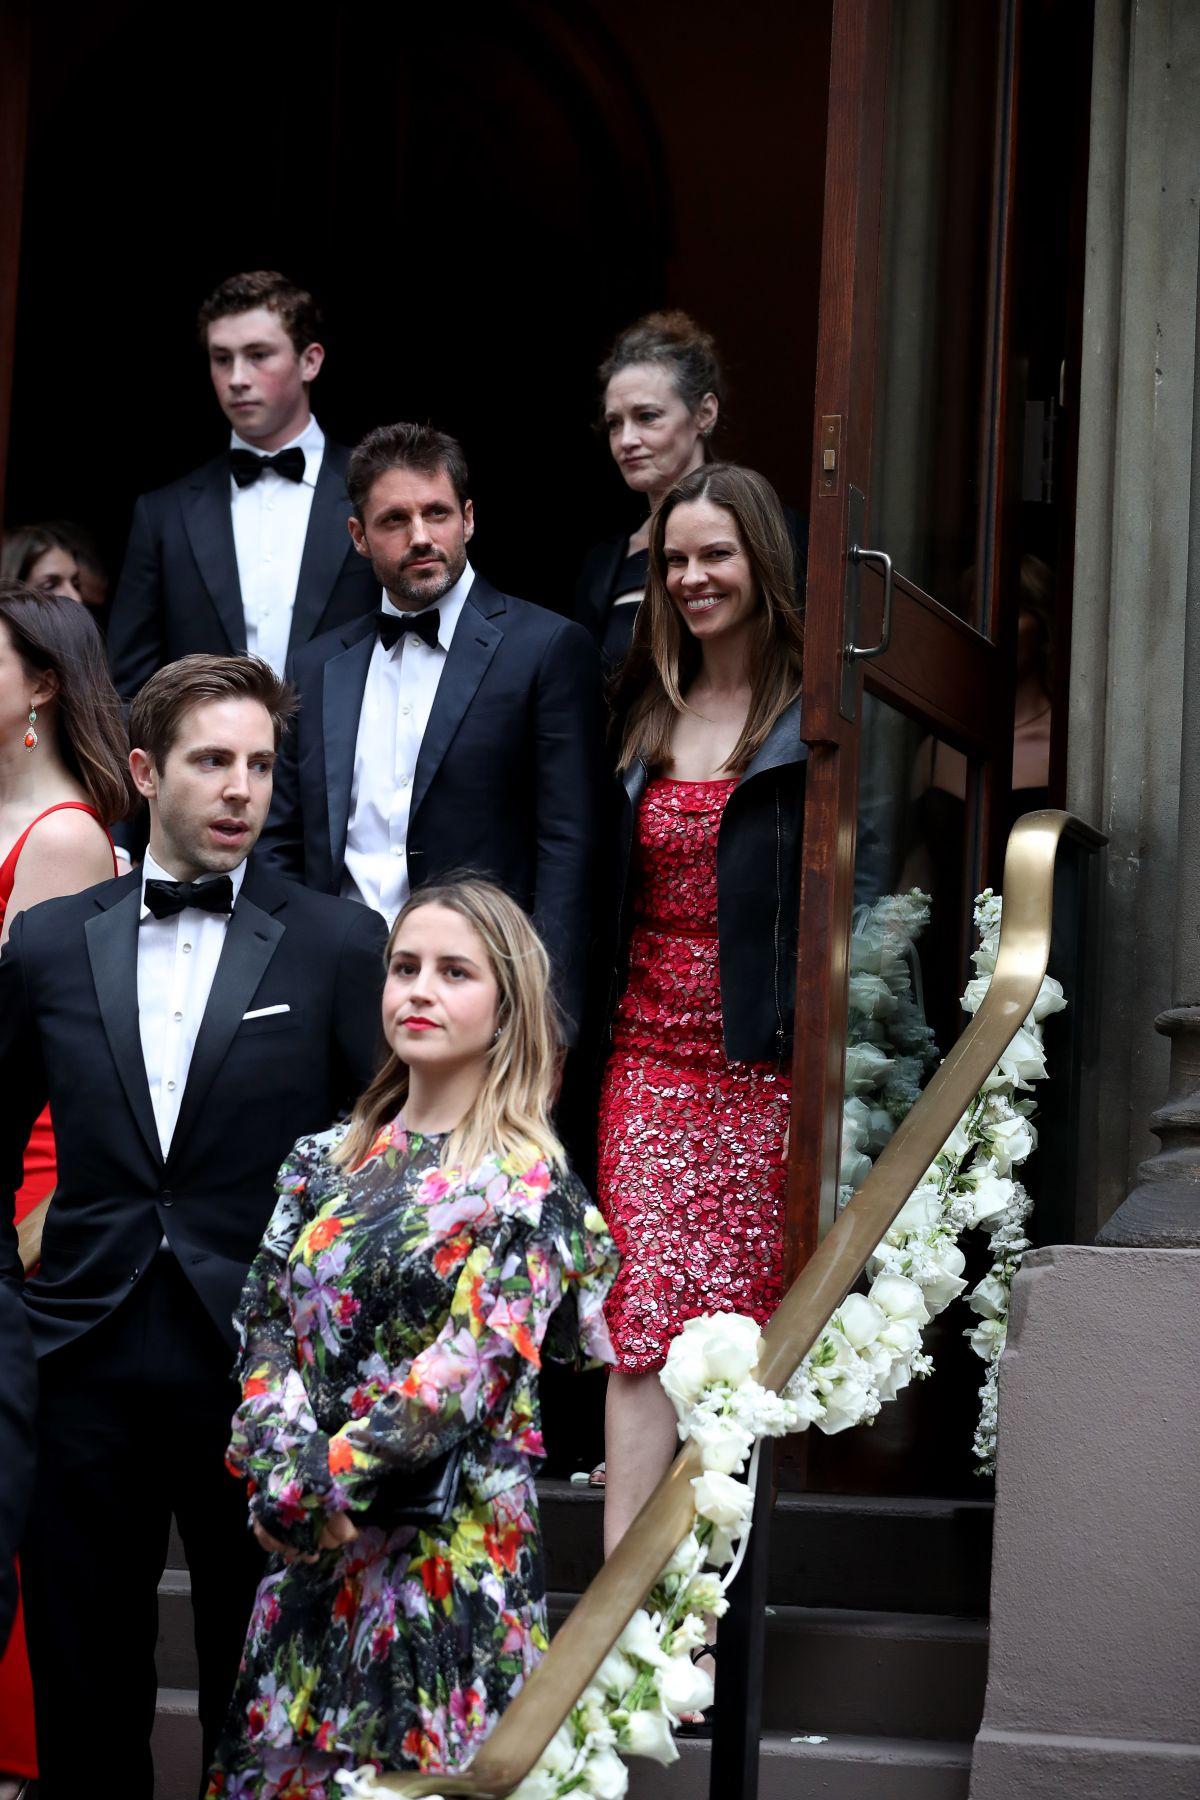 Emmy Rossum Wedding.Hilary Swank At Emmy Rossum S Wedding In New York 05 28 2017